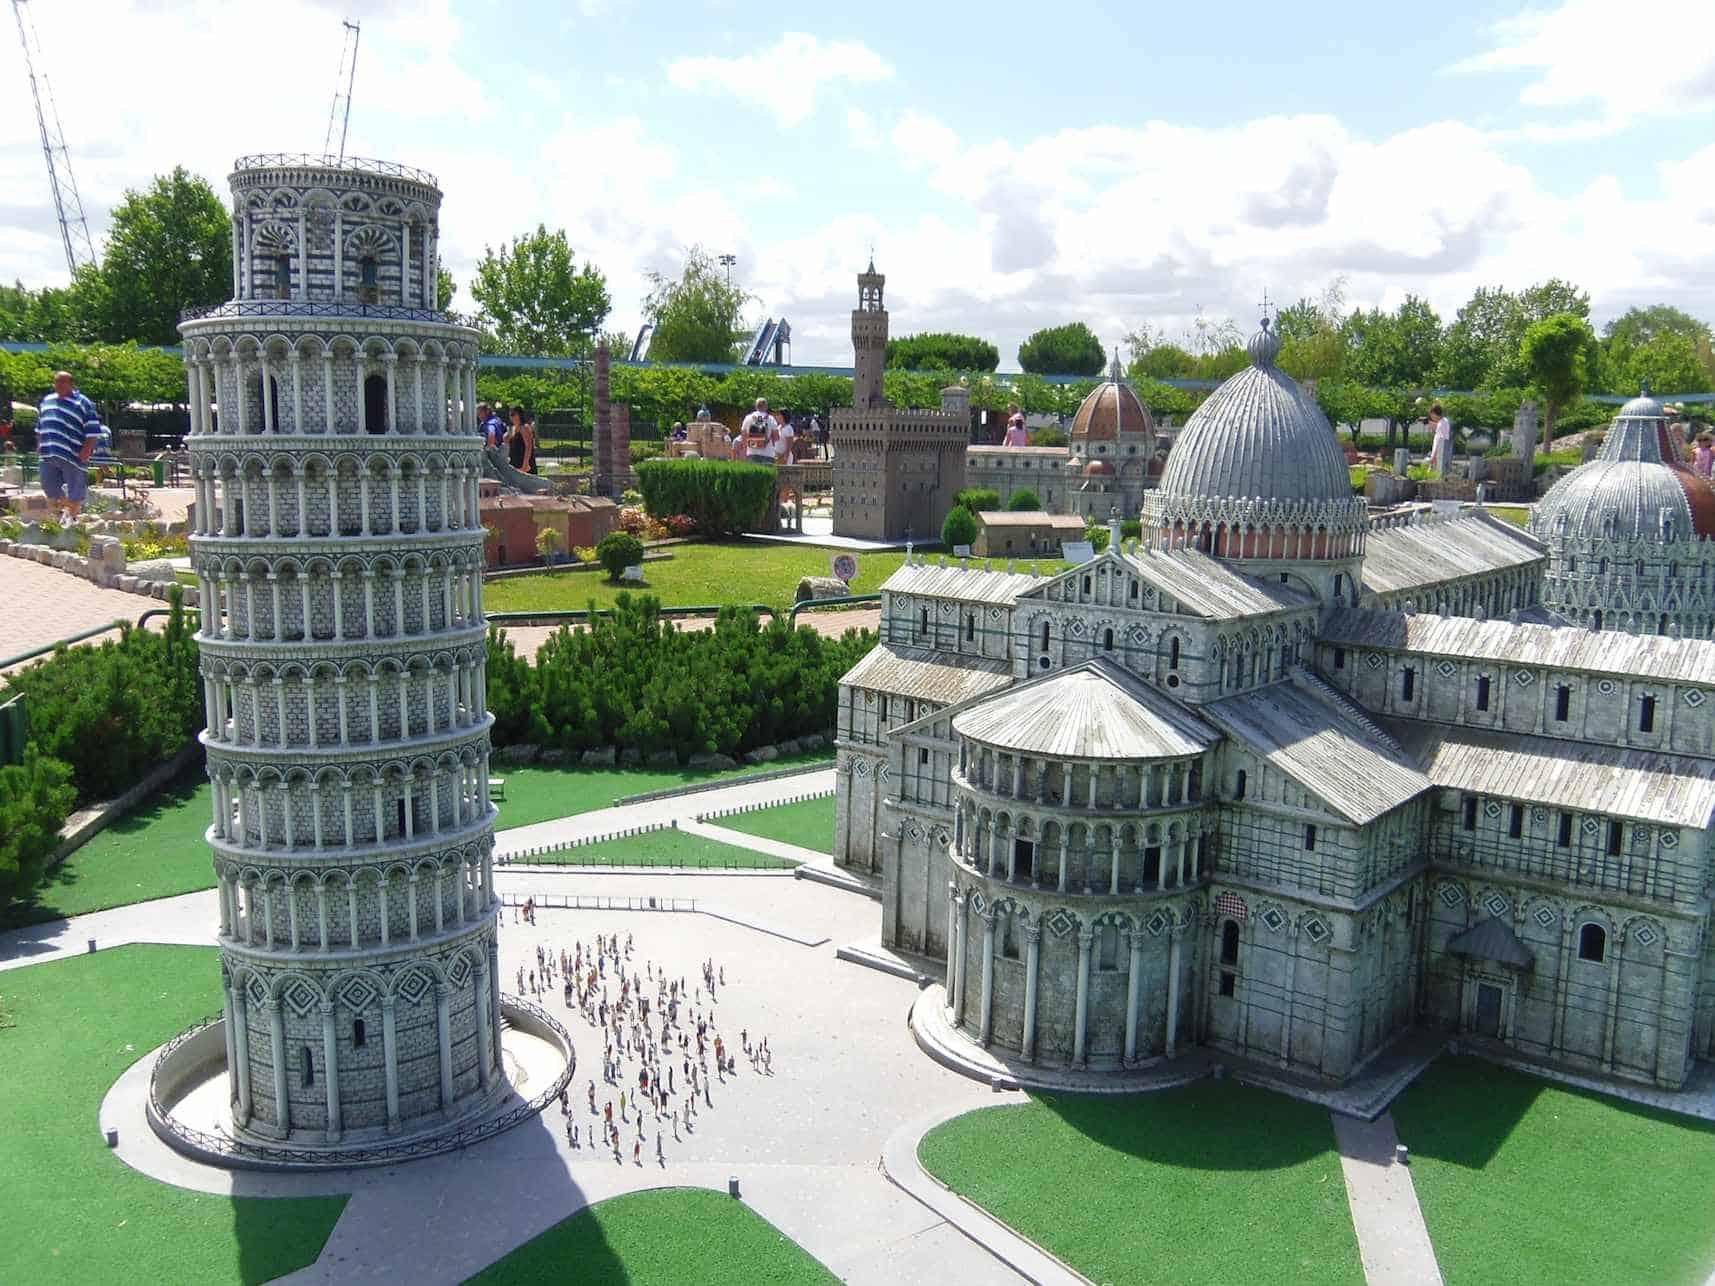 Italia in Miniatura (c) Srsck